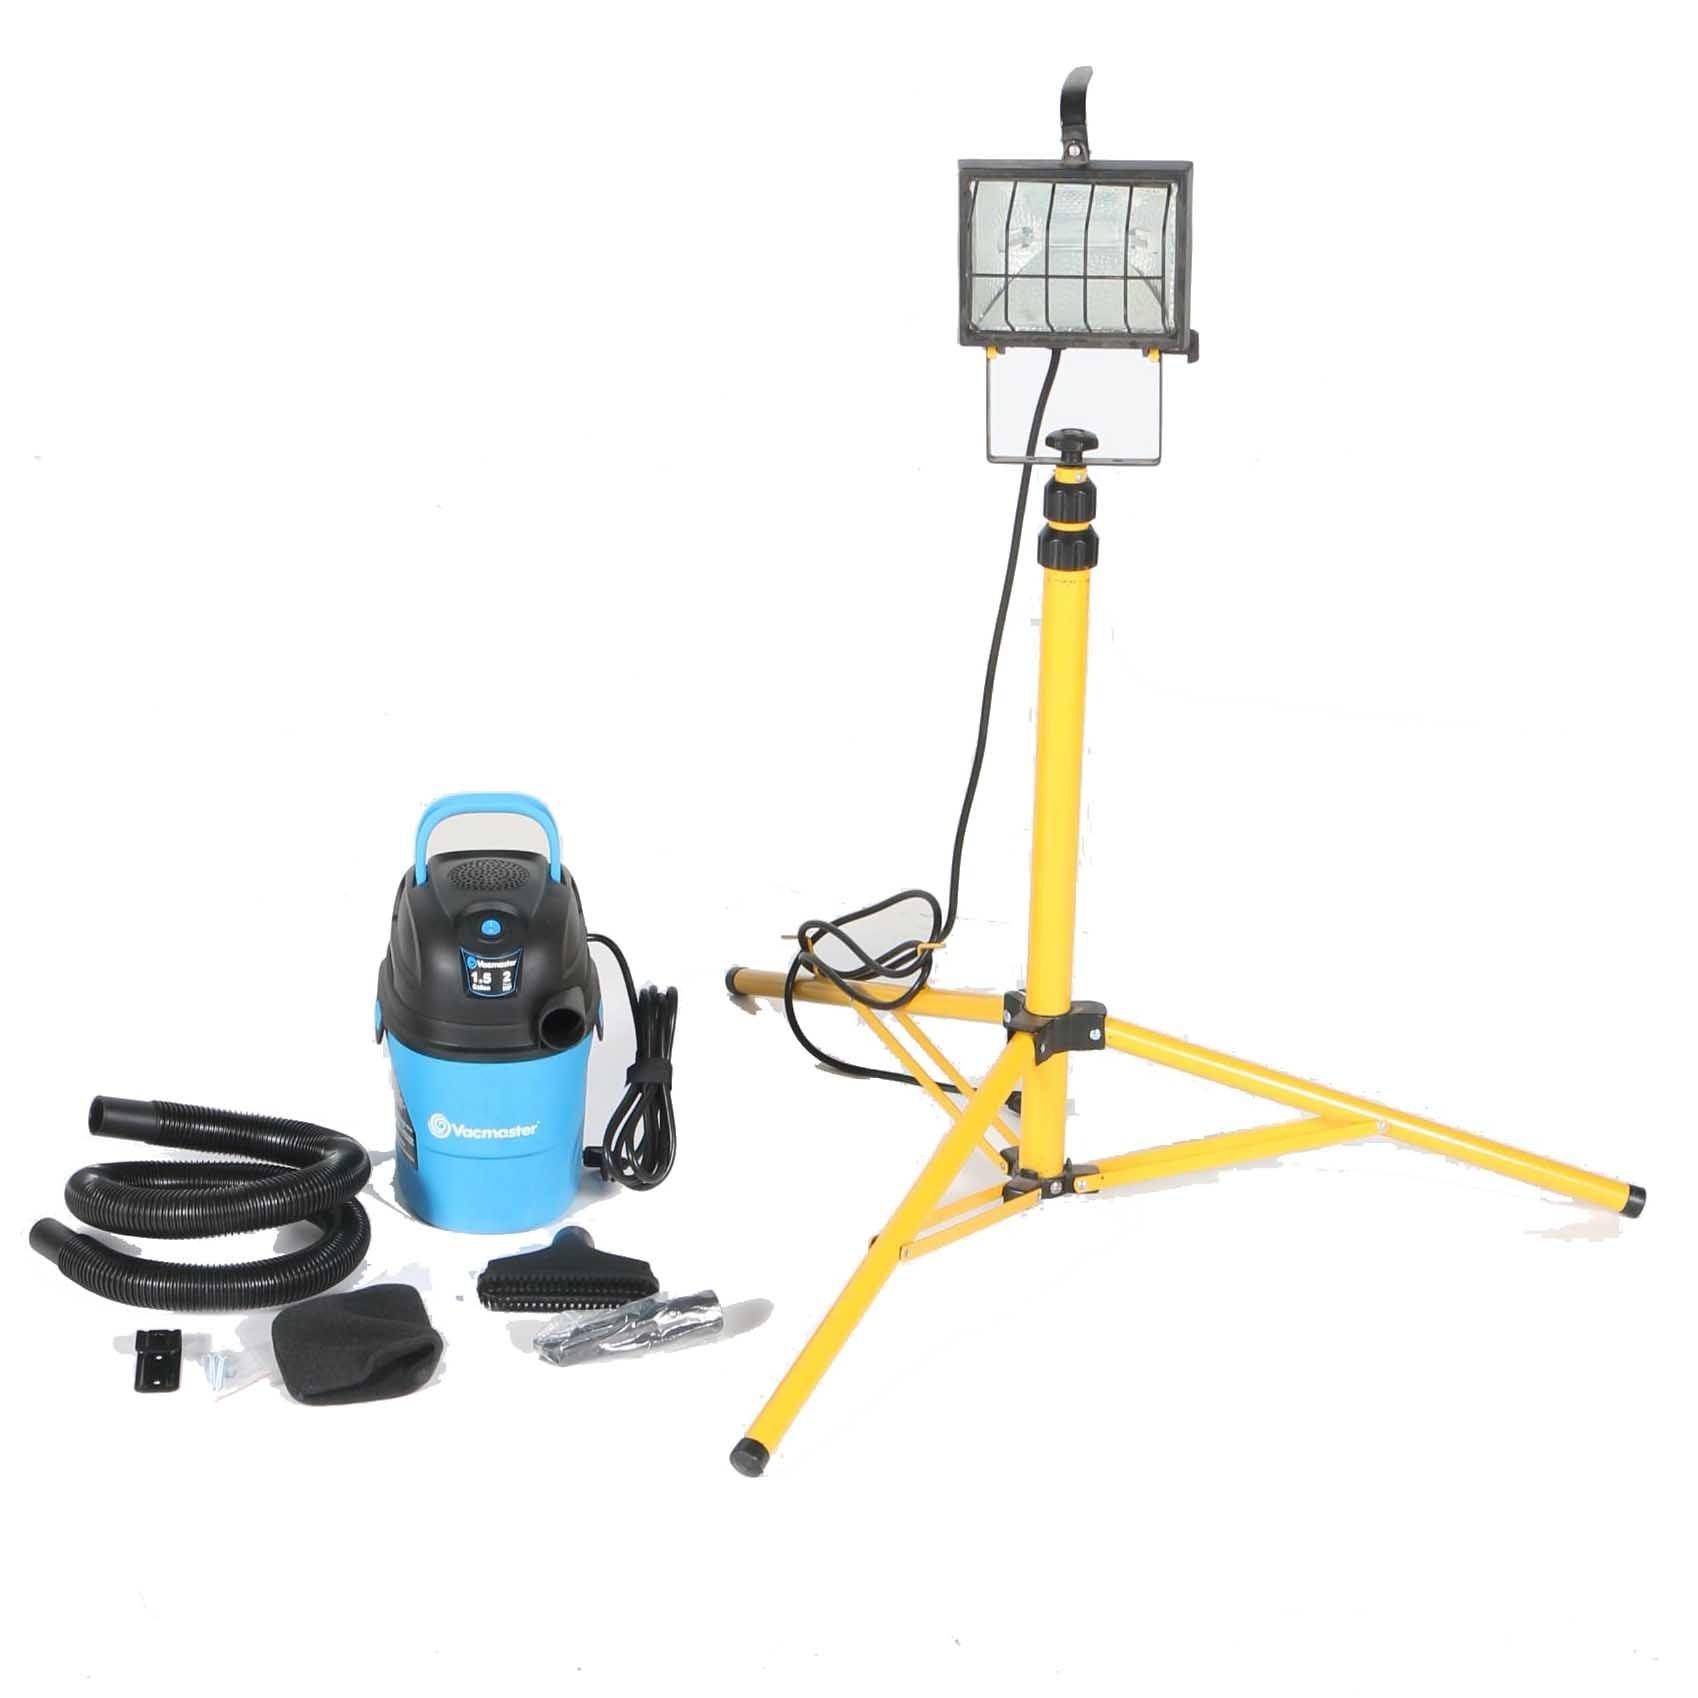 Work Light and Vacuum